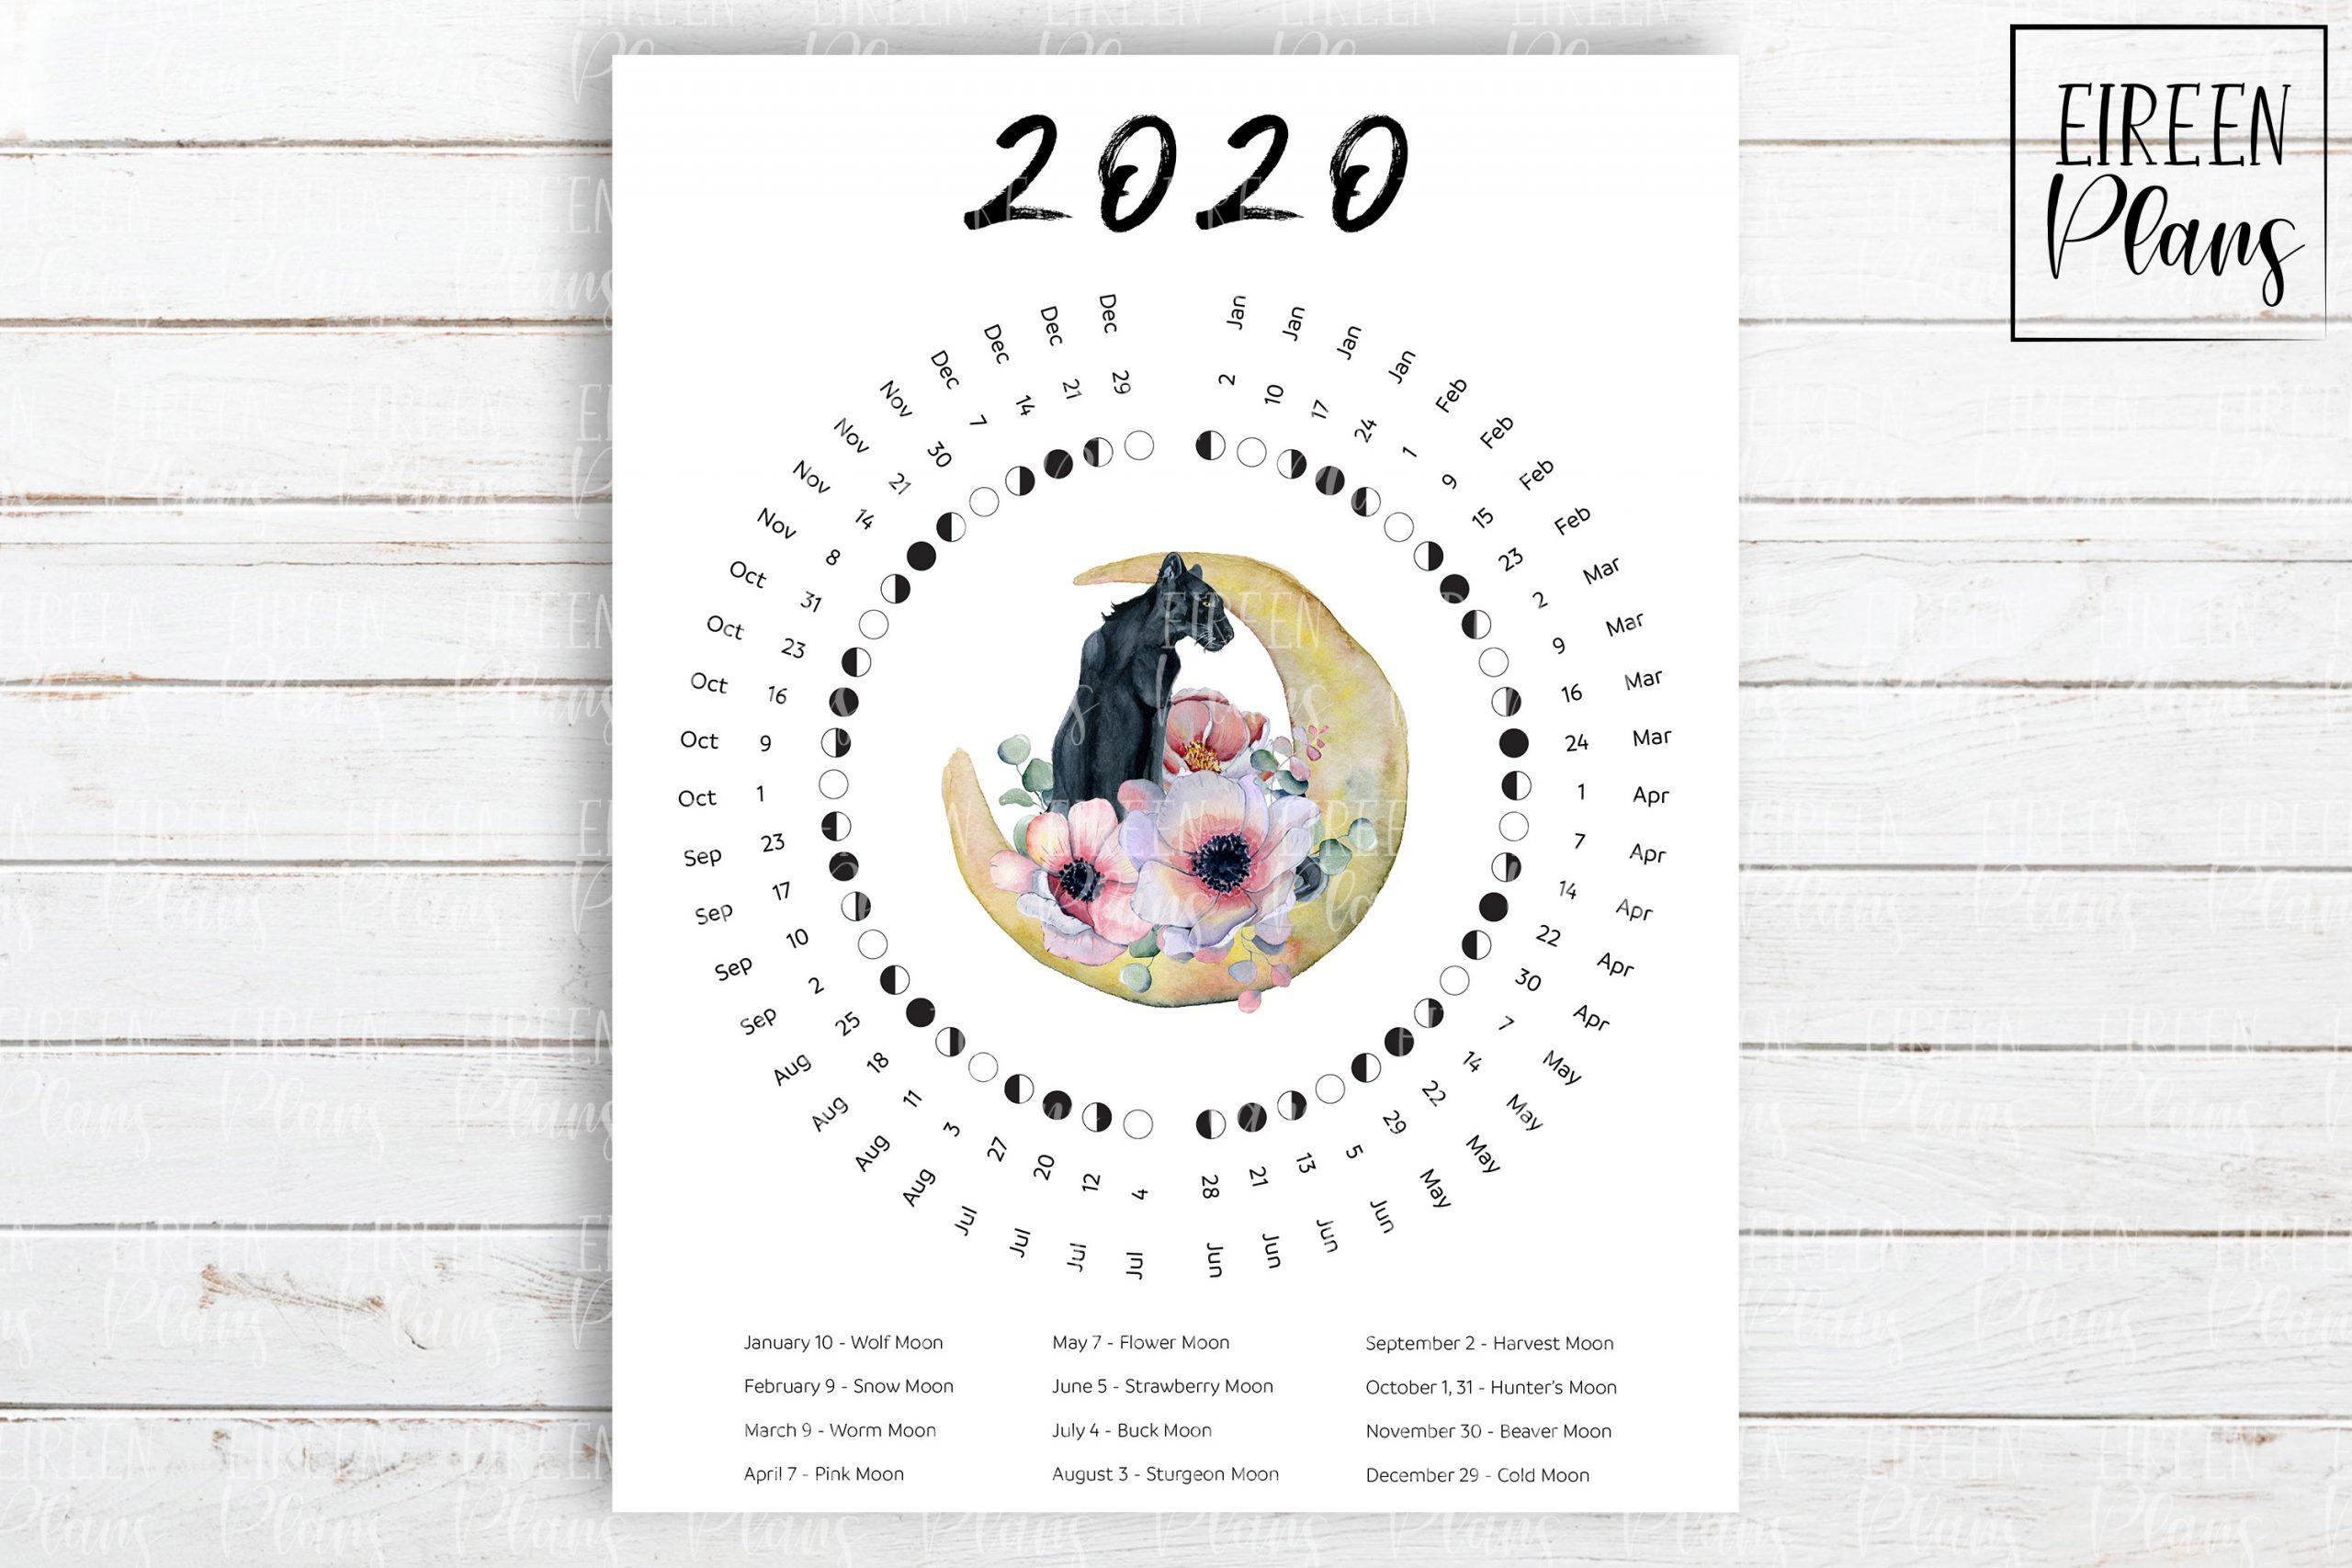 Printable 2020 Moon Phases Calendar With Moon Names